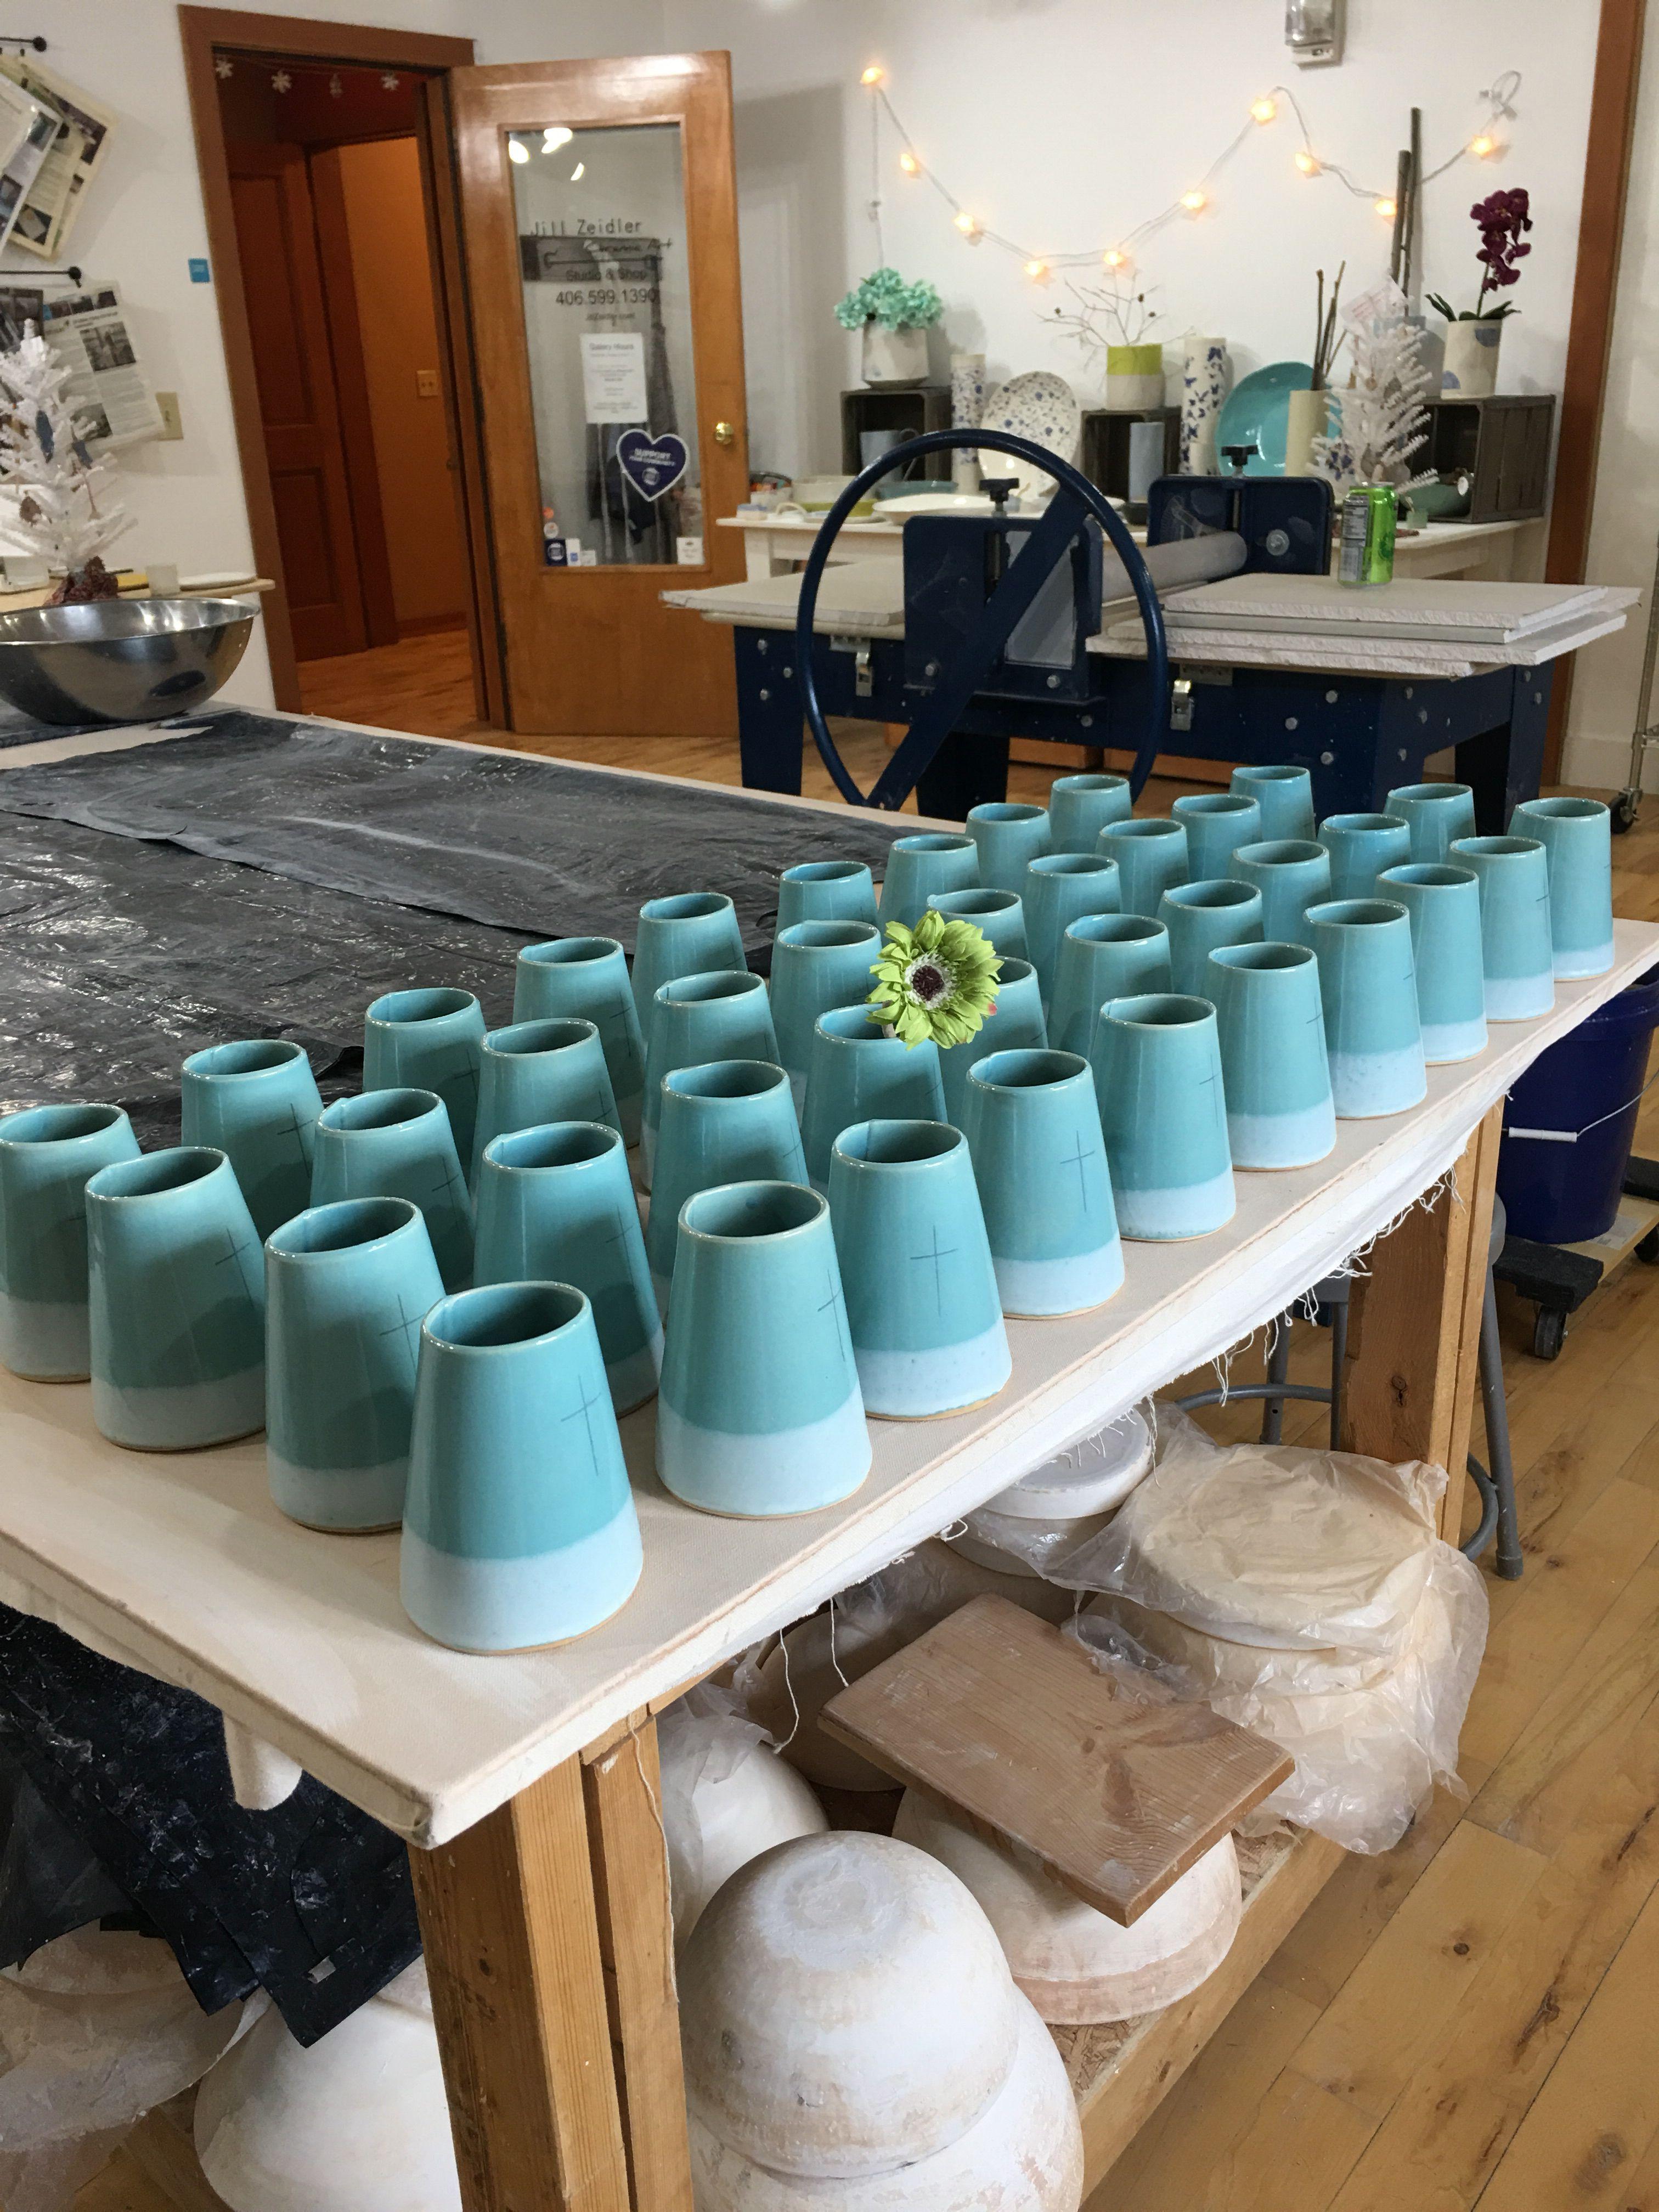 New Vase Design Coming In 2019